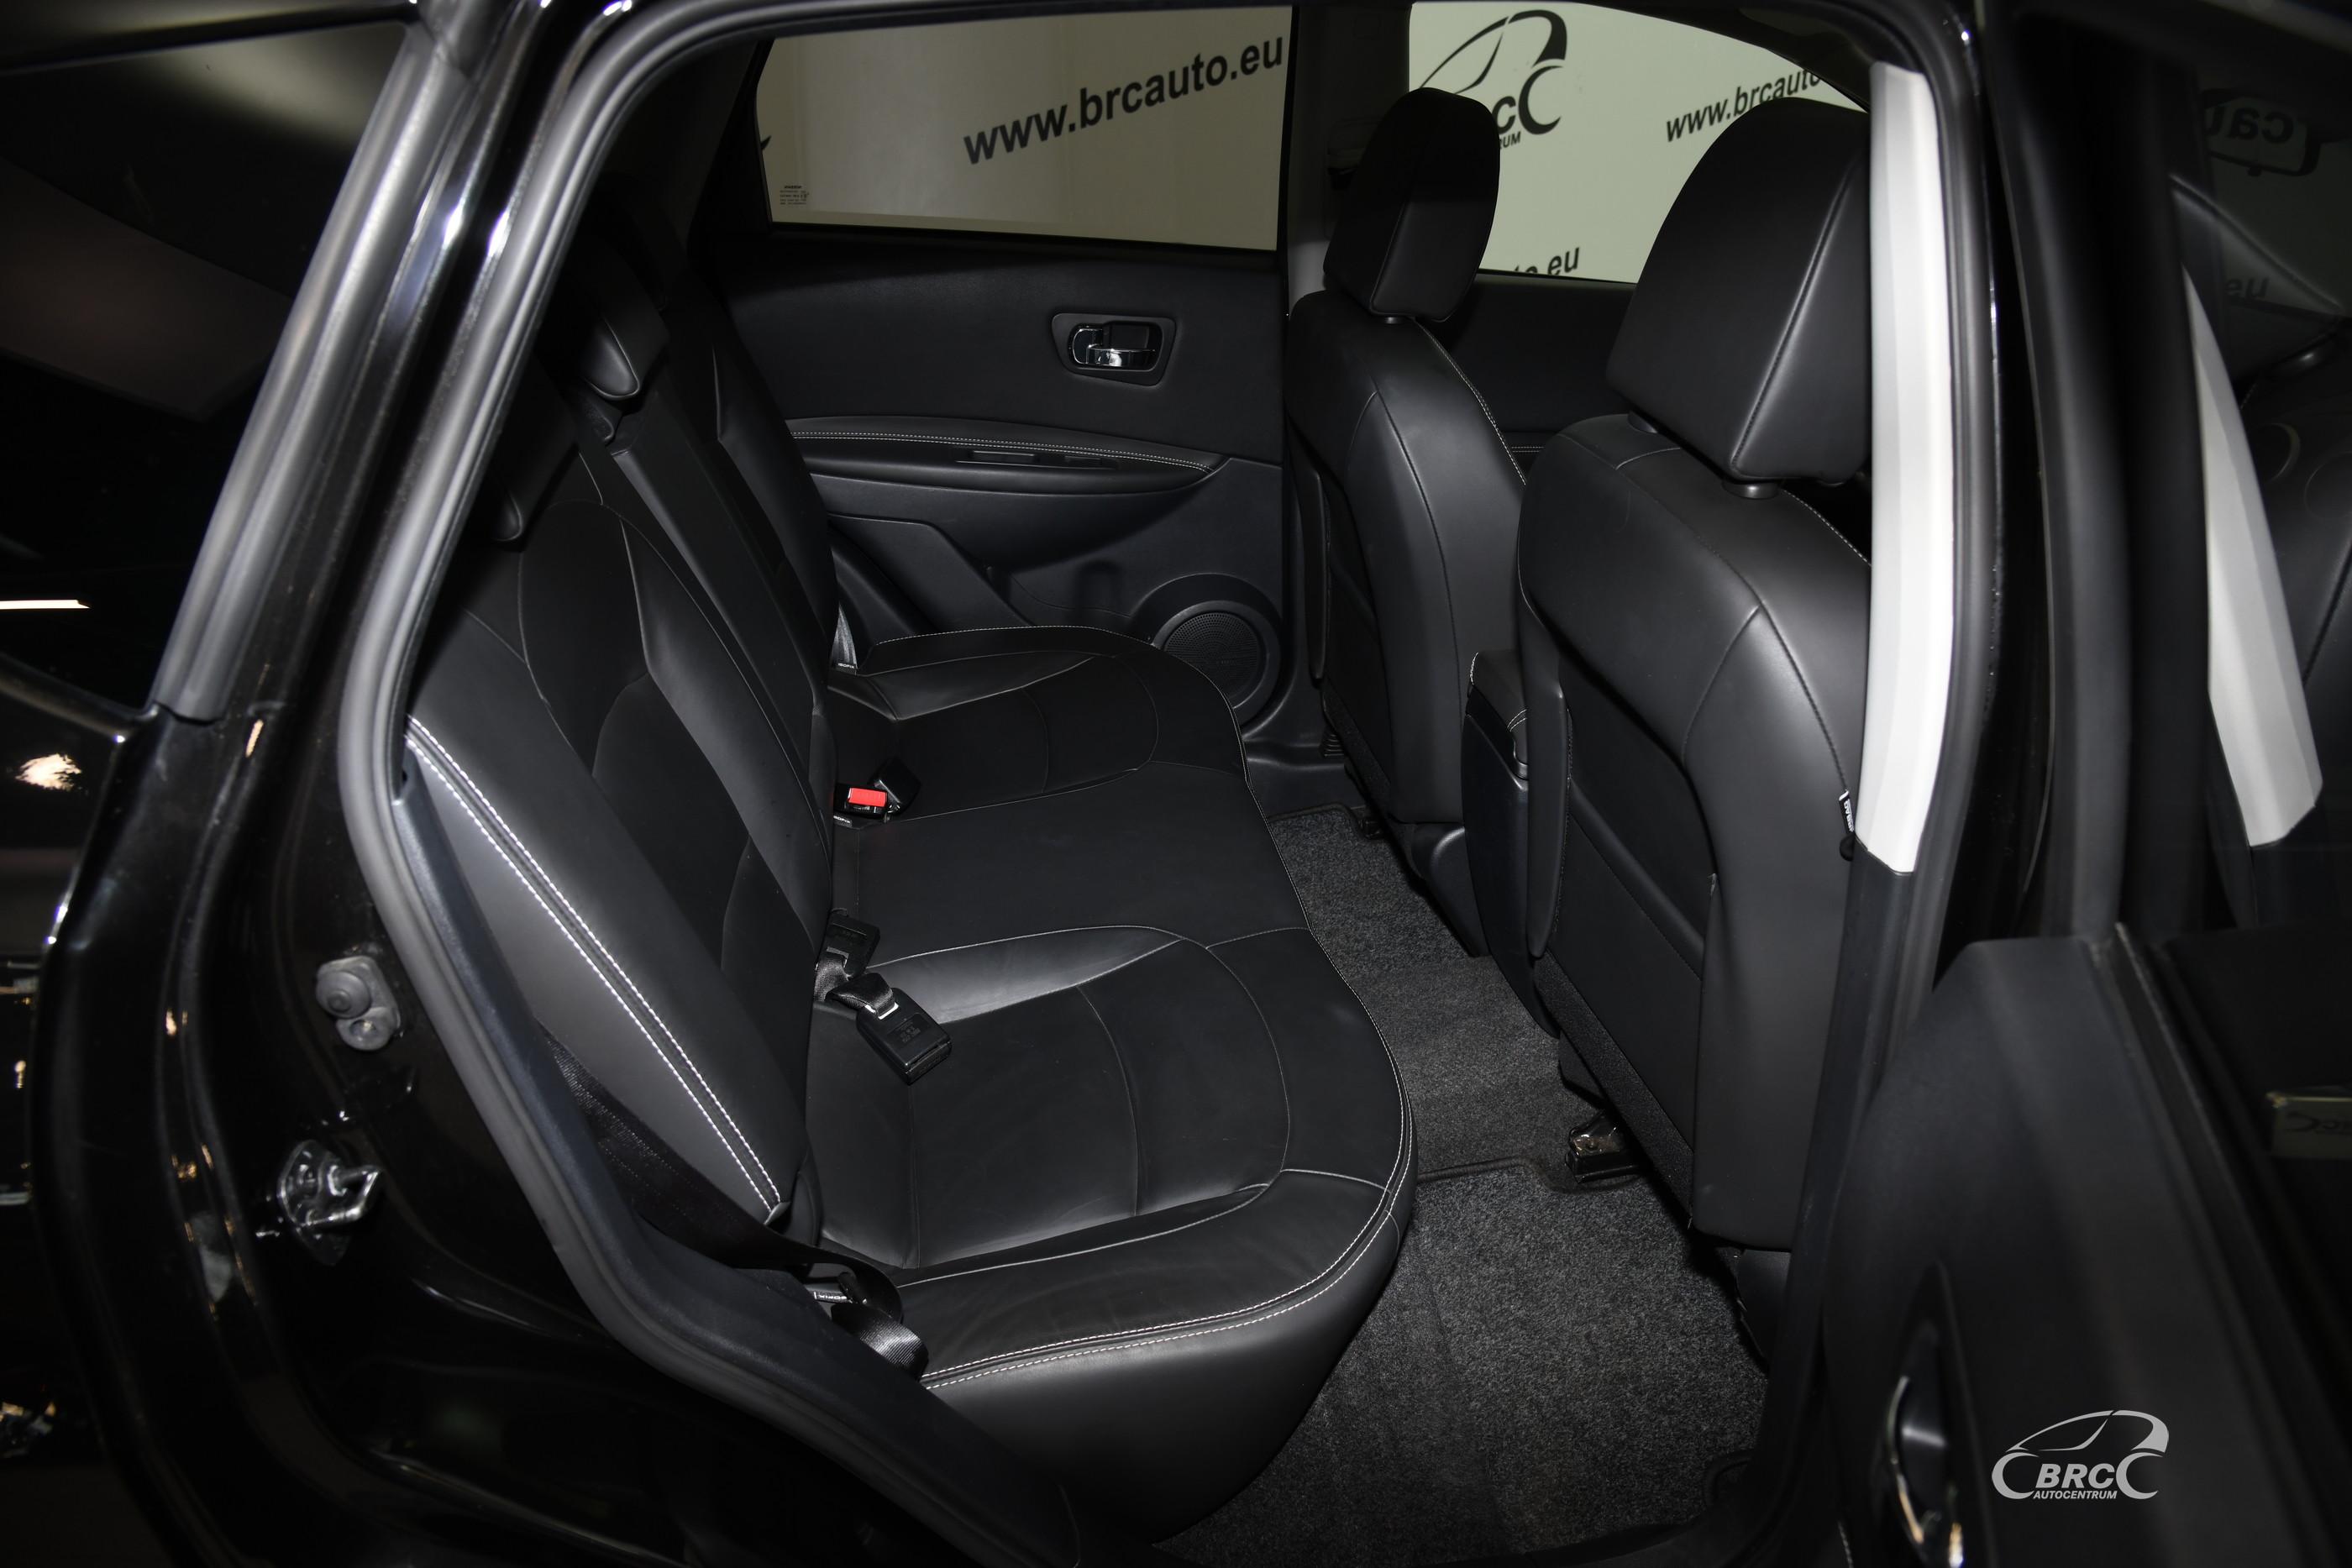 Nissan Qashqai 2.0 dCi Automatas